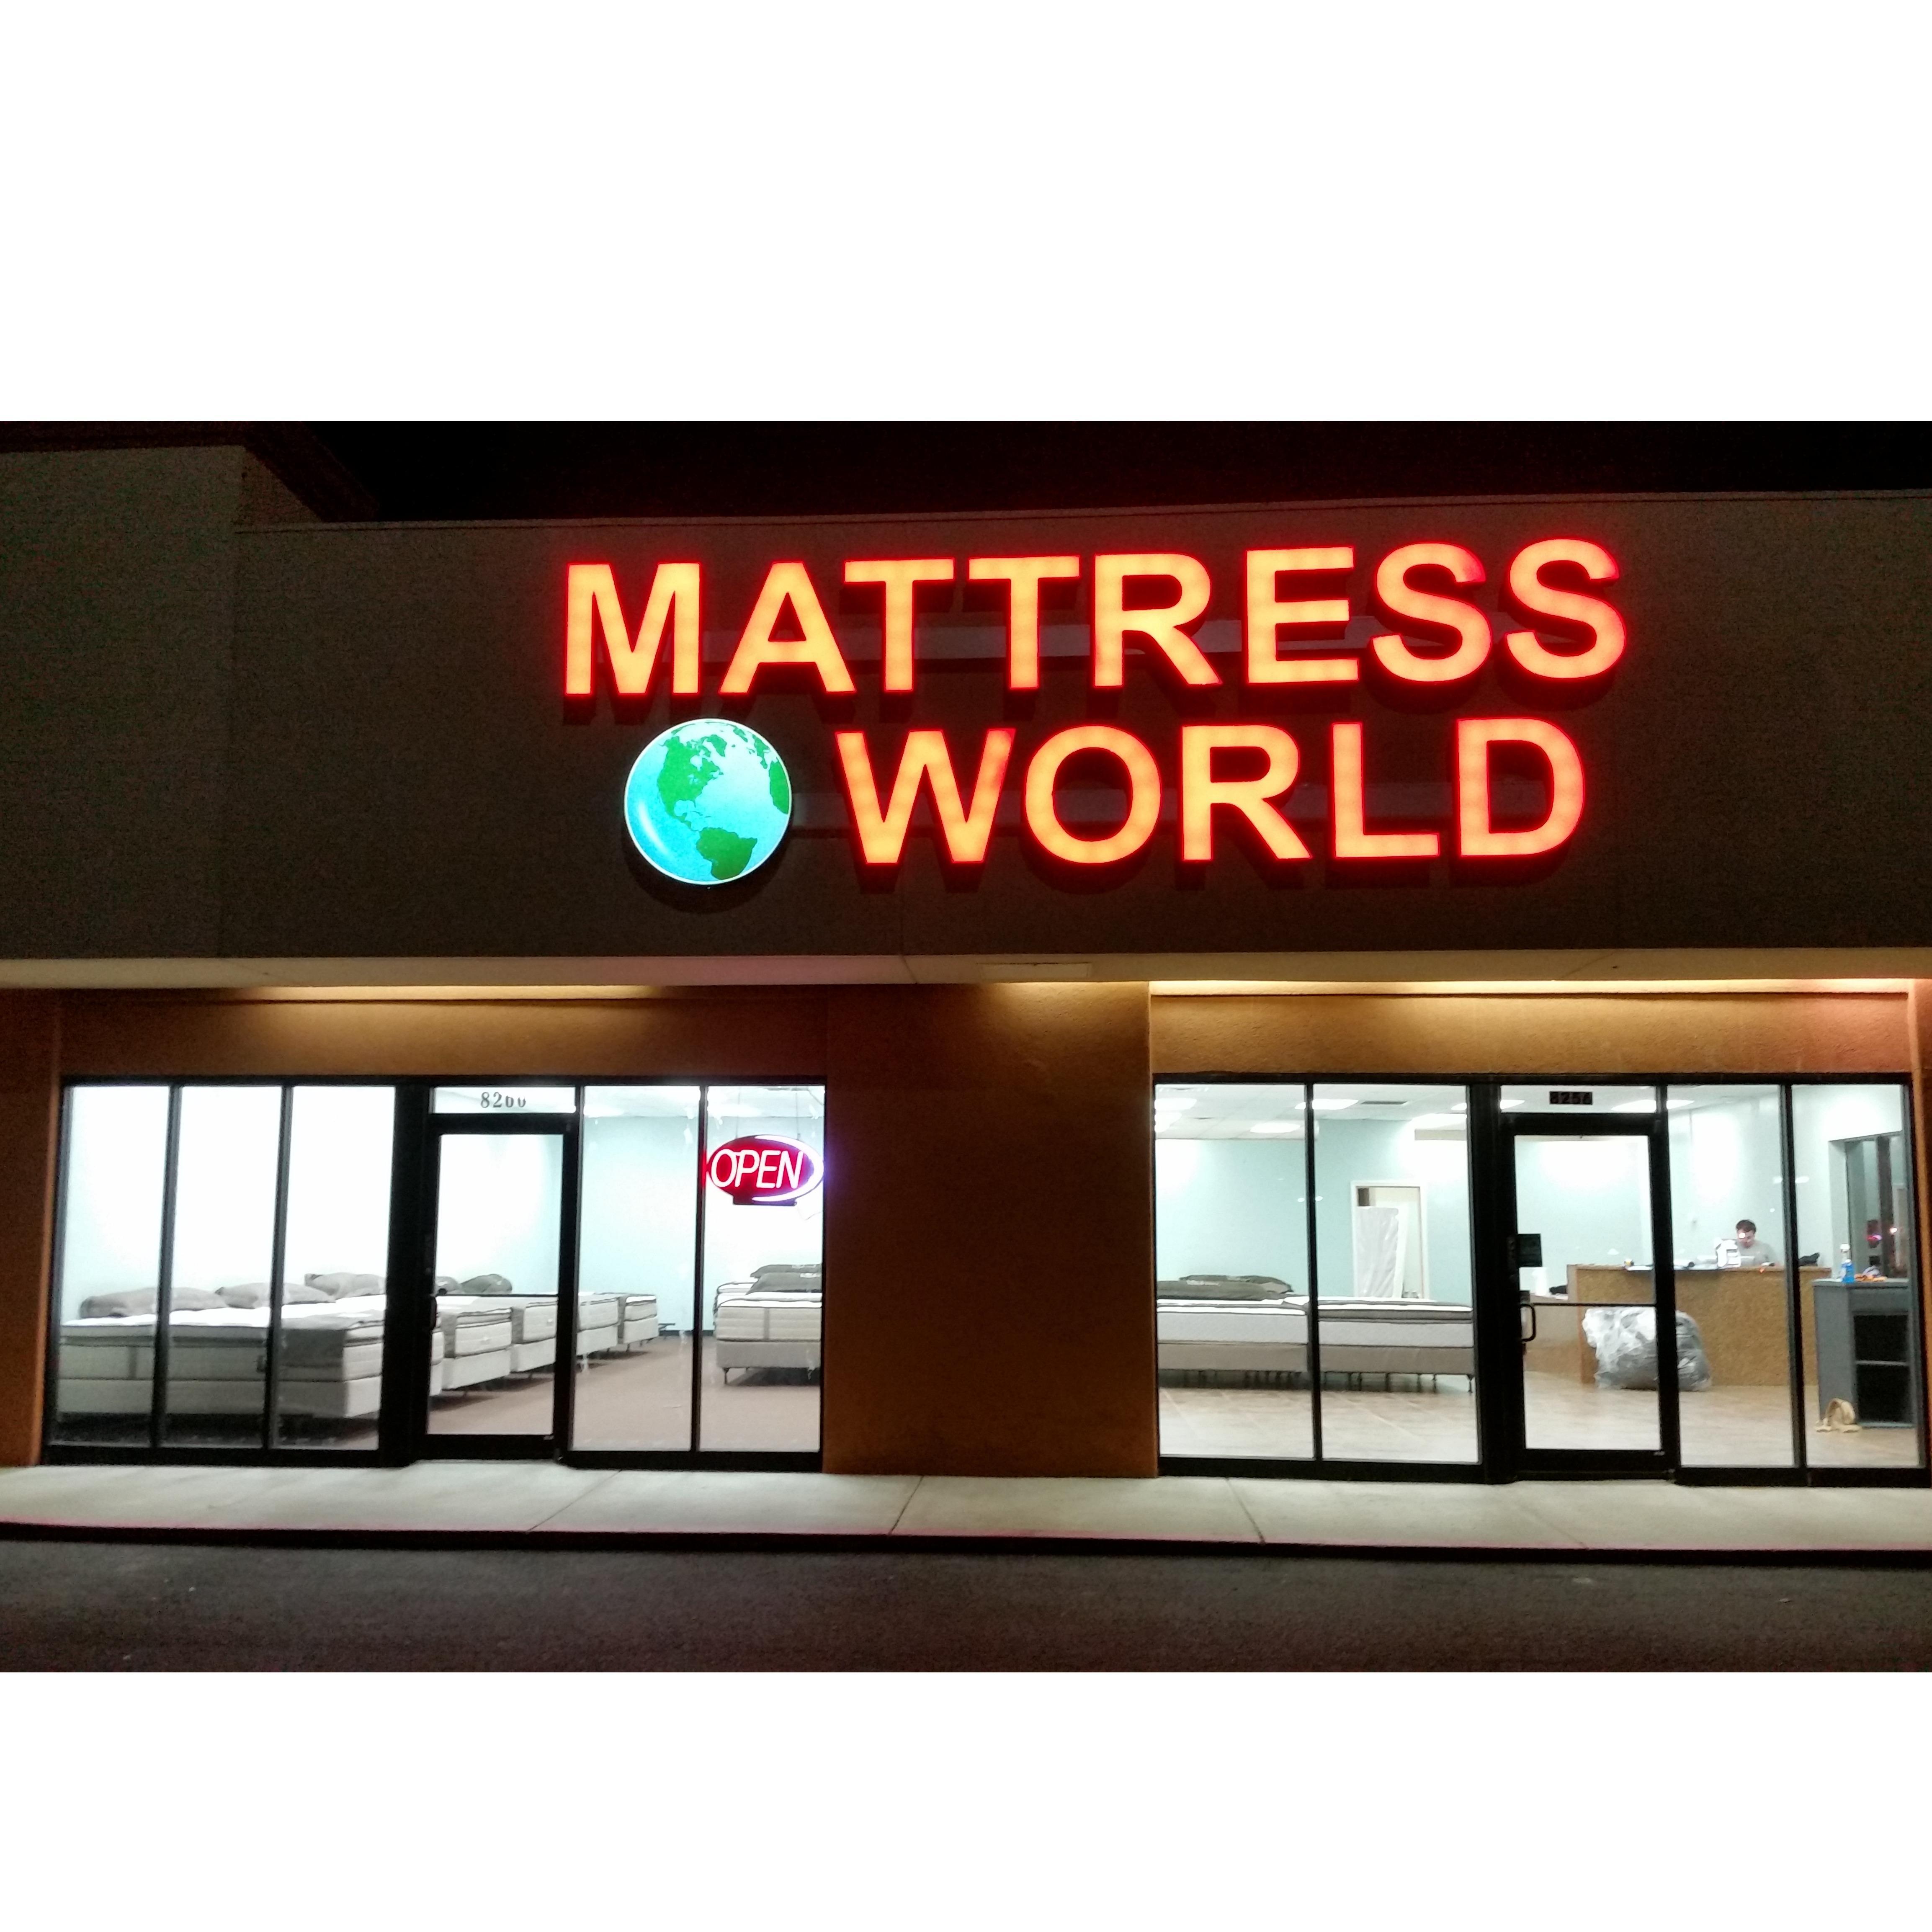 Mattress World - Tulsa, OK 74133 - (918)250-0562 | ShowMeLocal.com